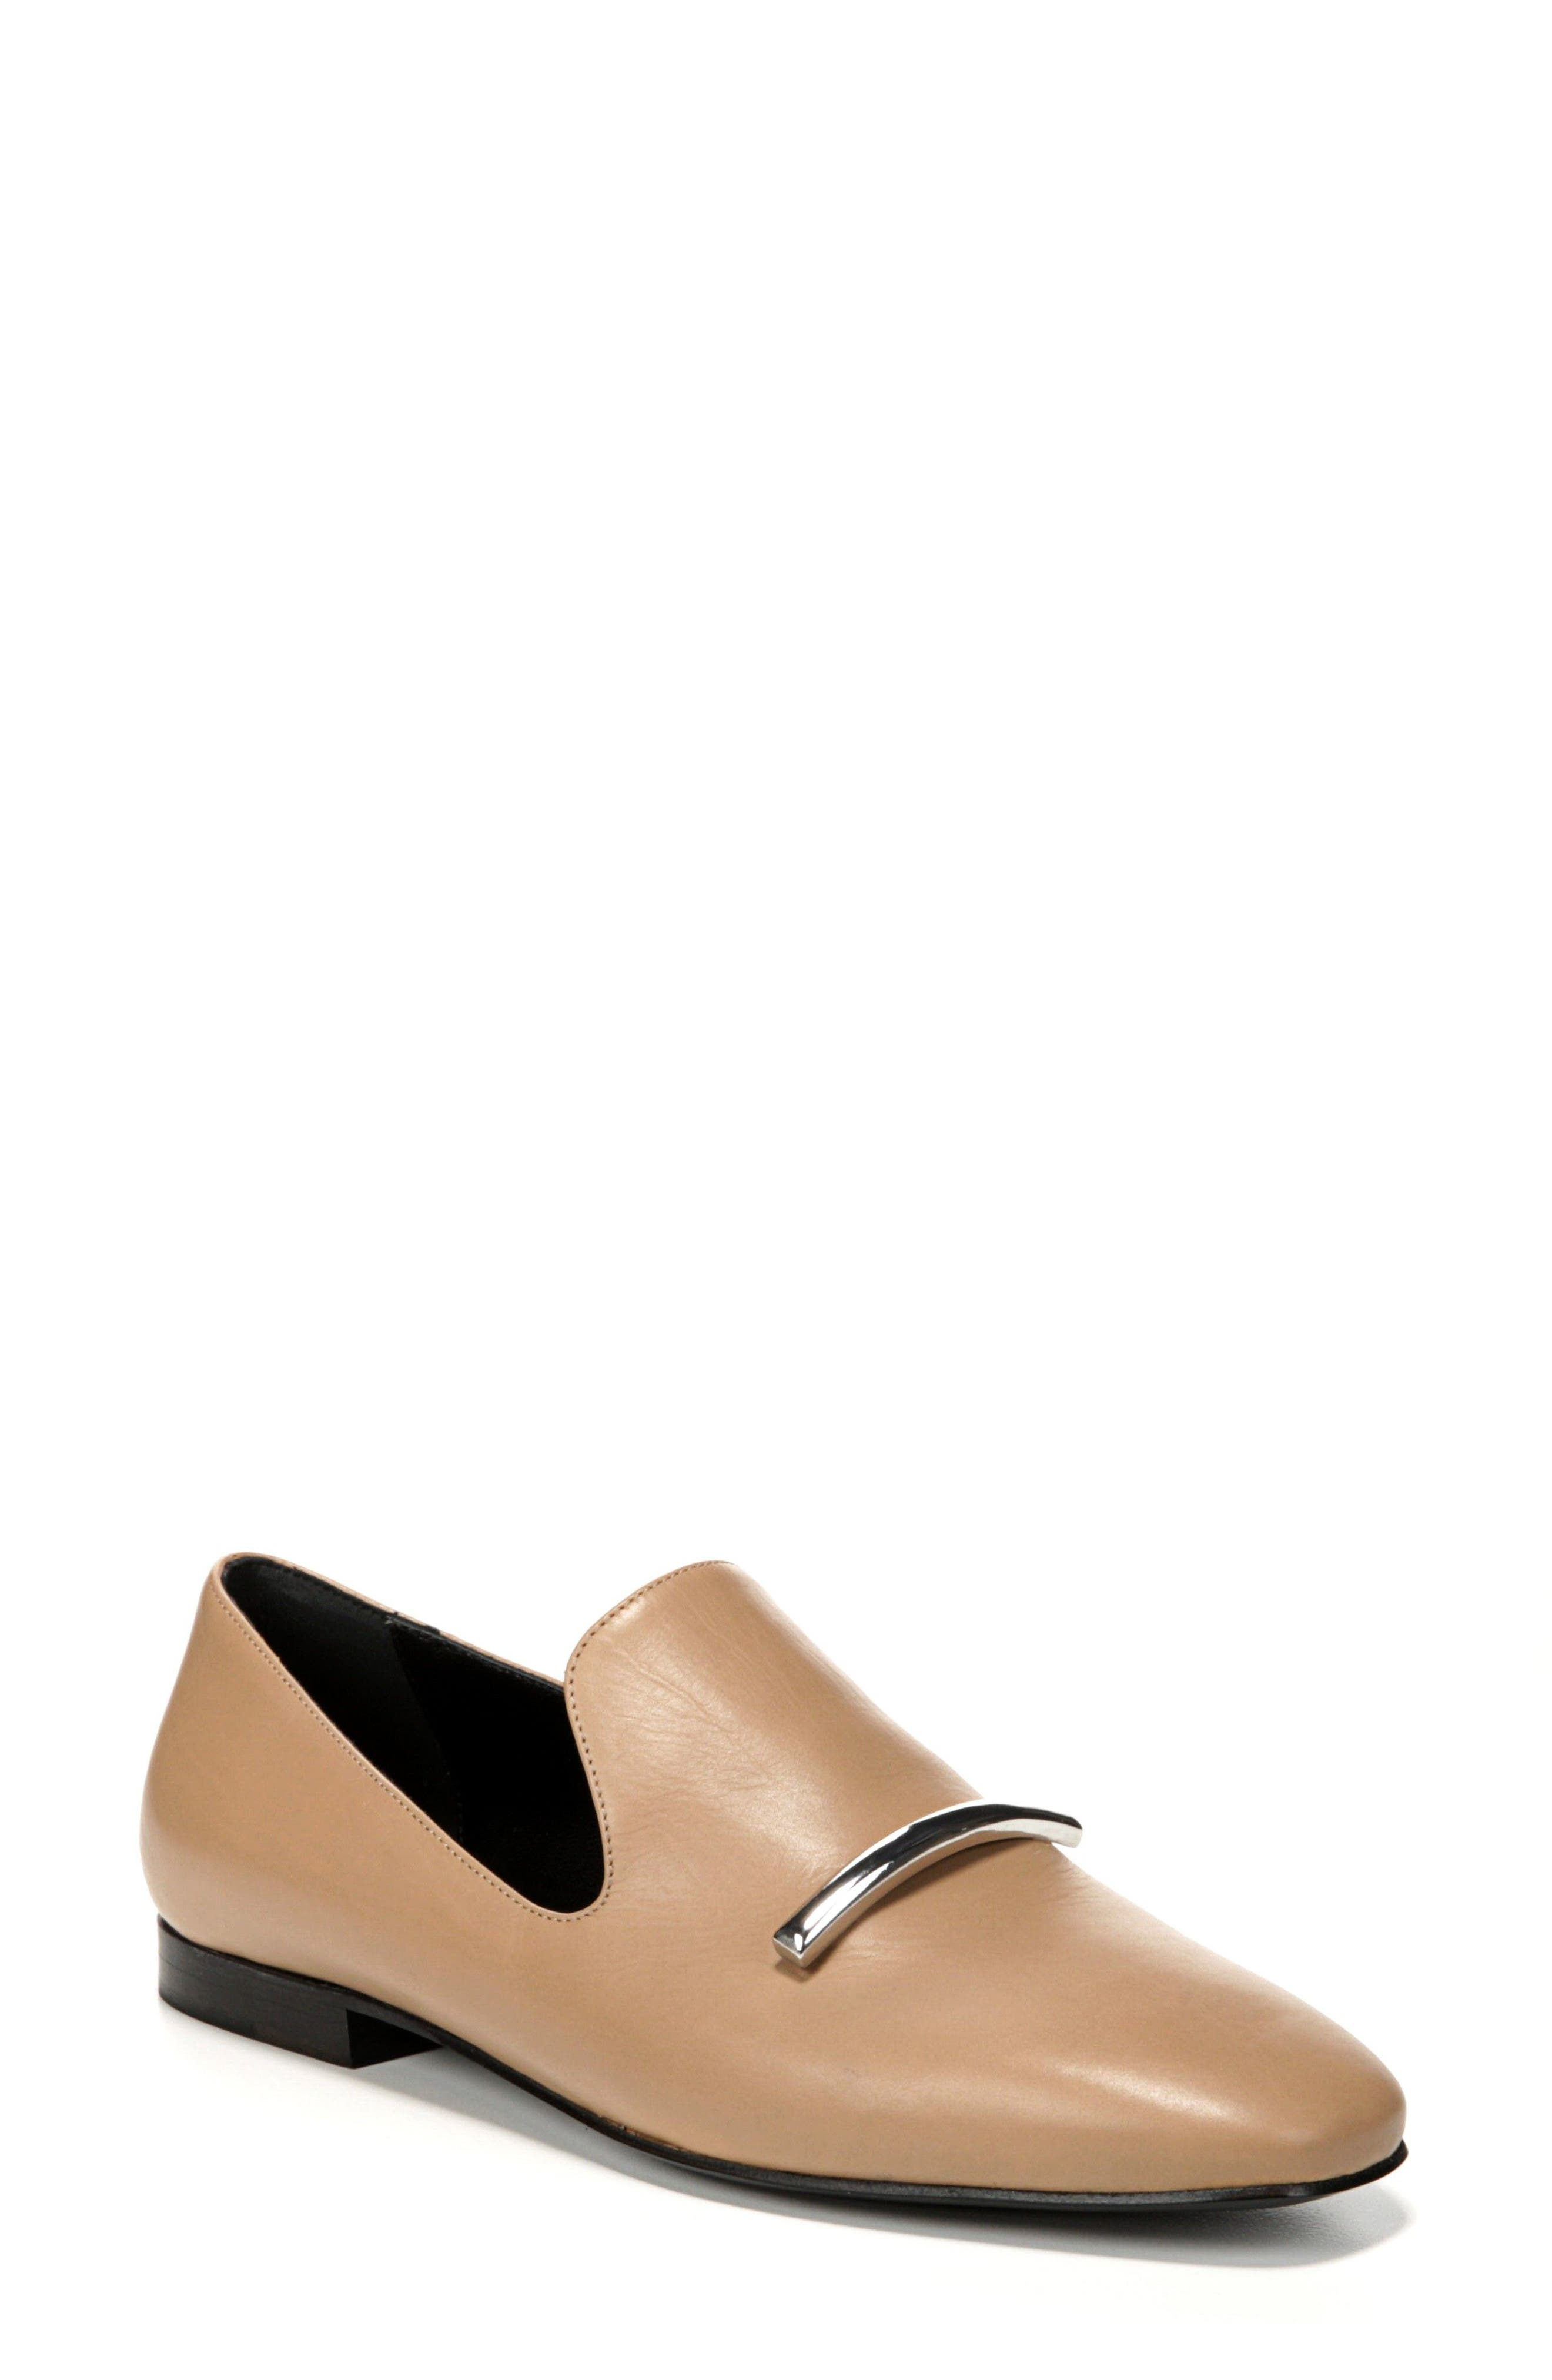 VIA SPIGA Tallis Flat Loafer, Main, color, 250